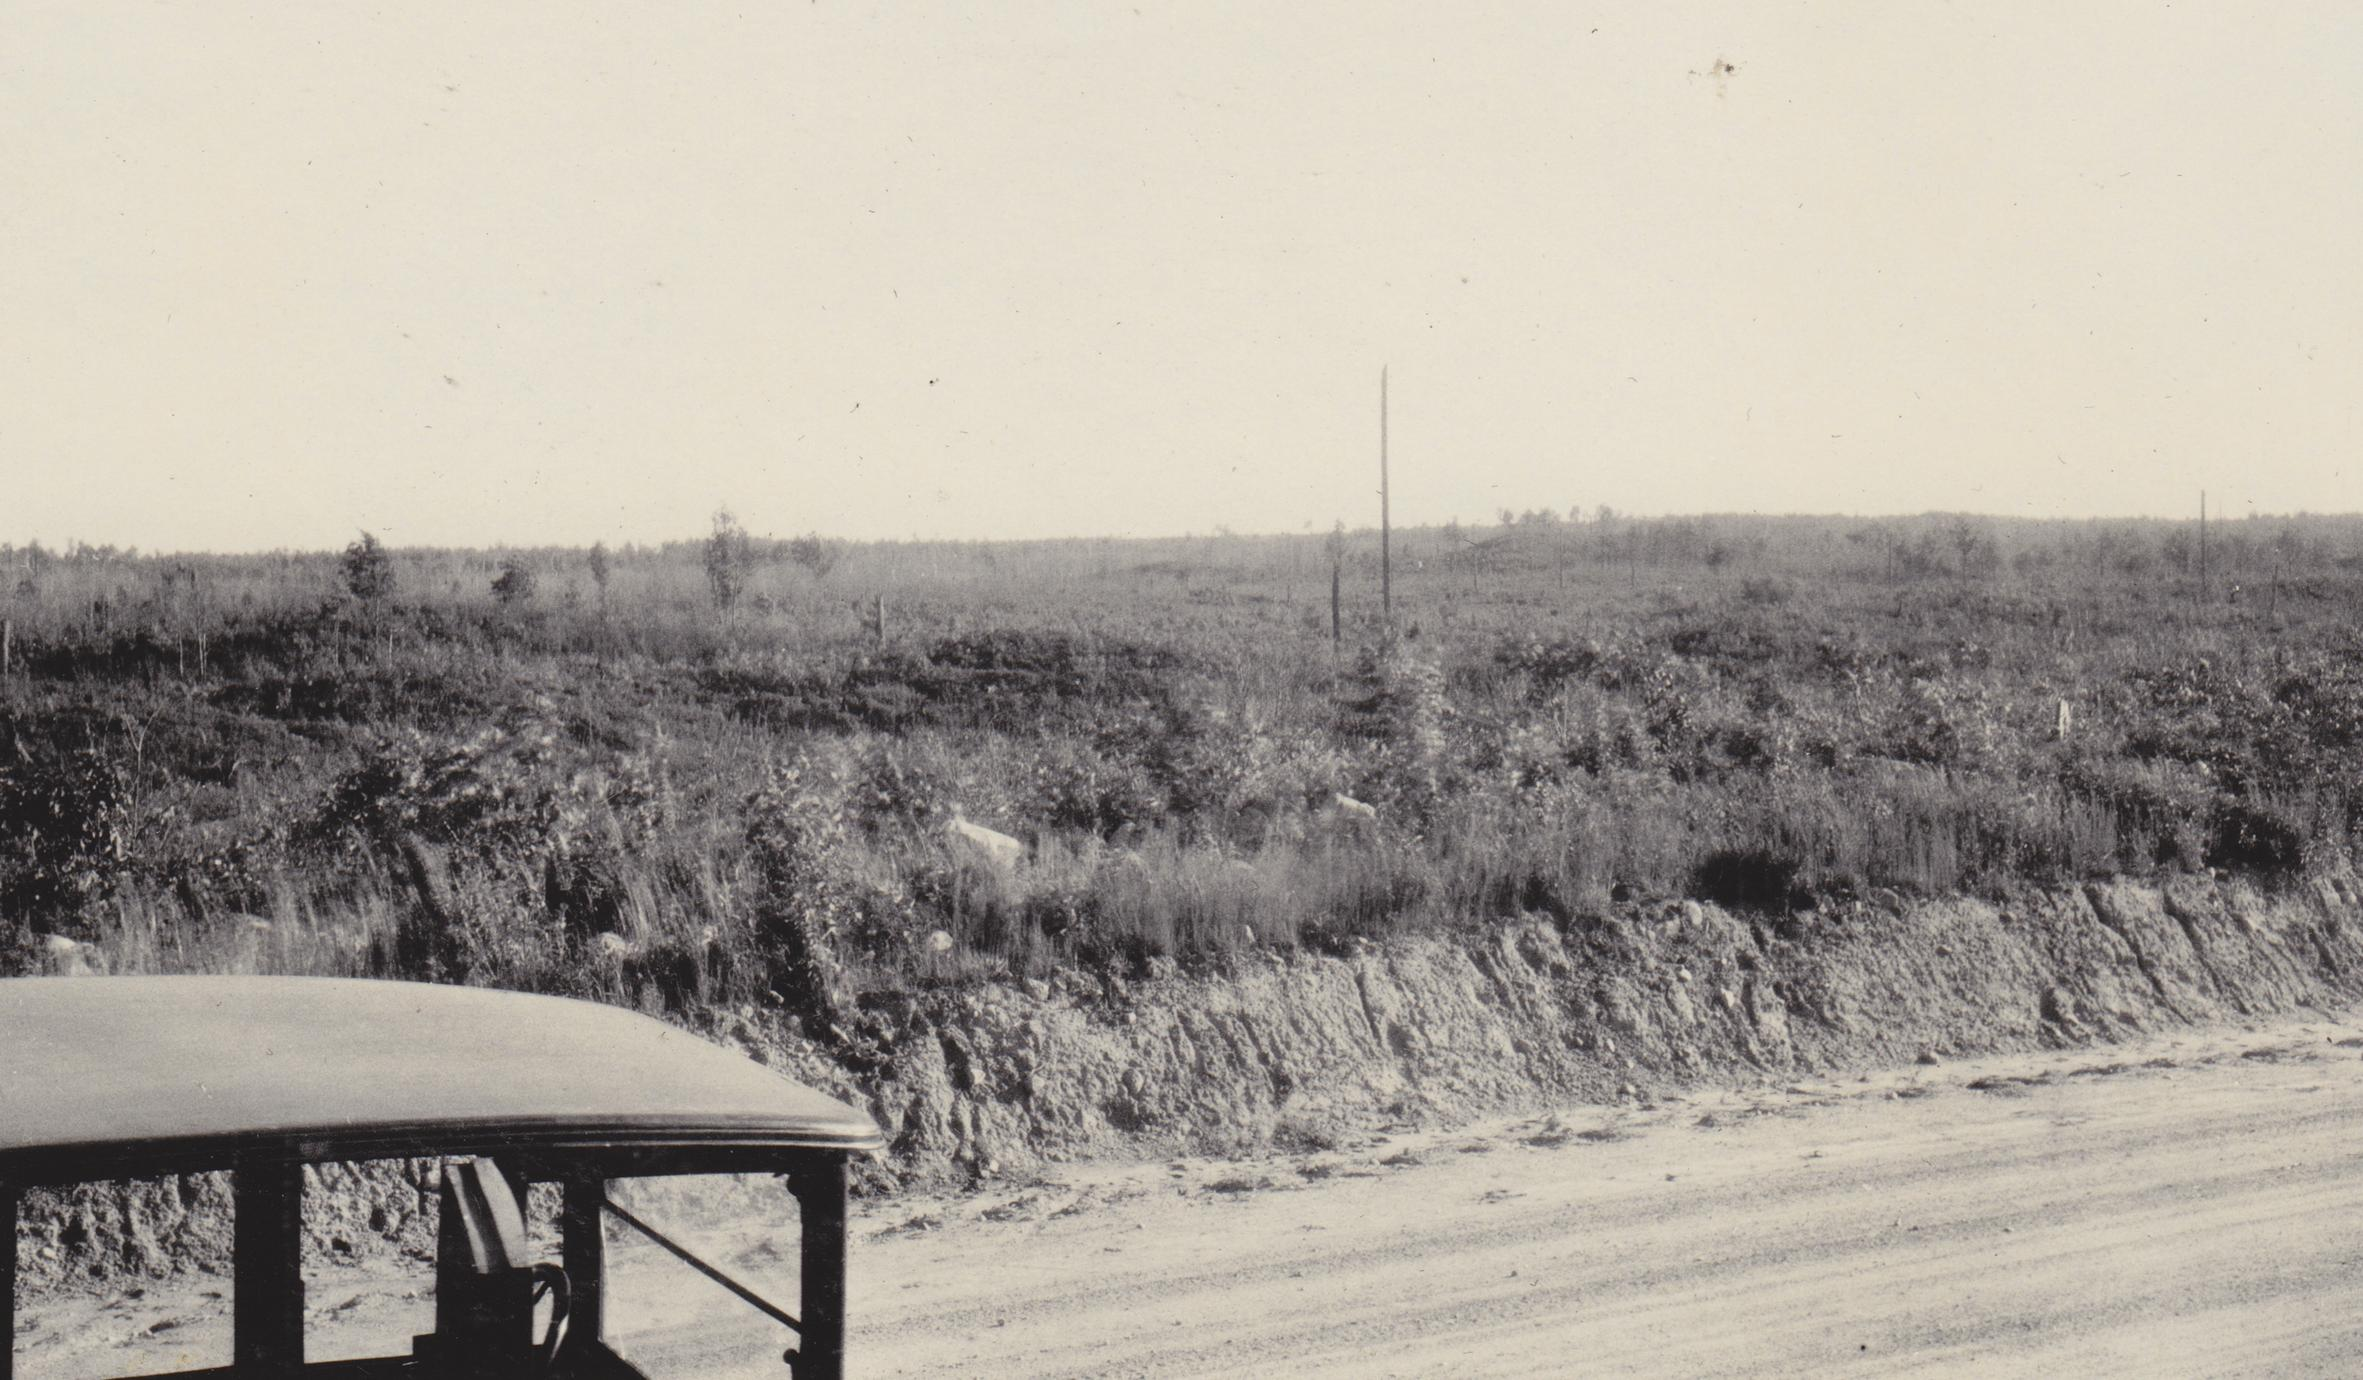 Moraine near Hatley, WI